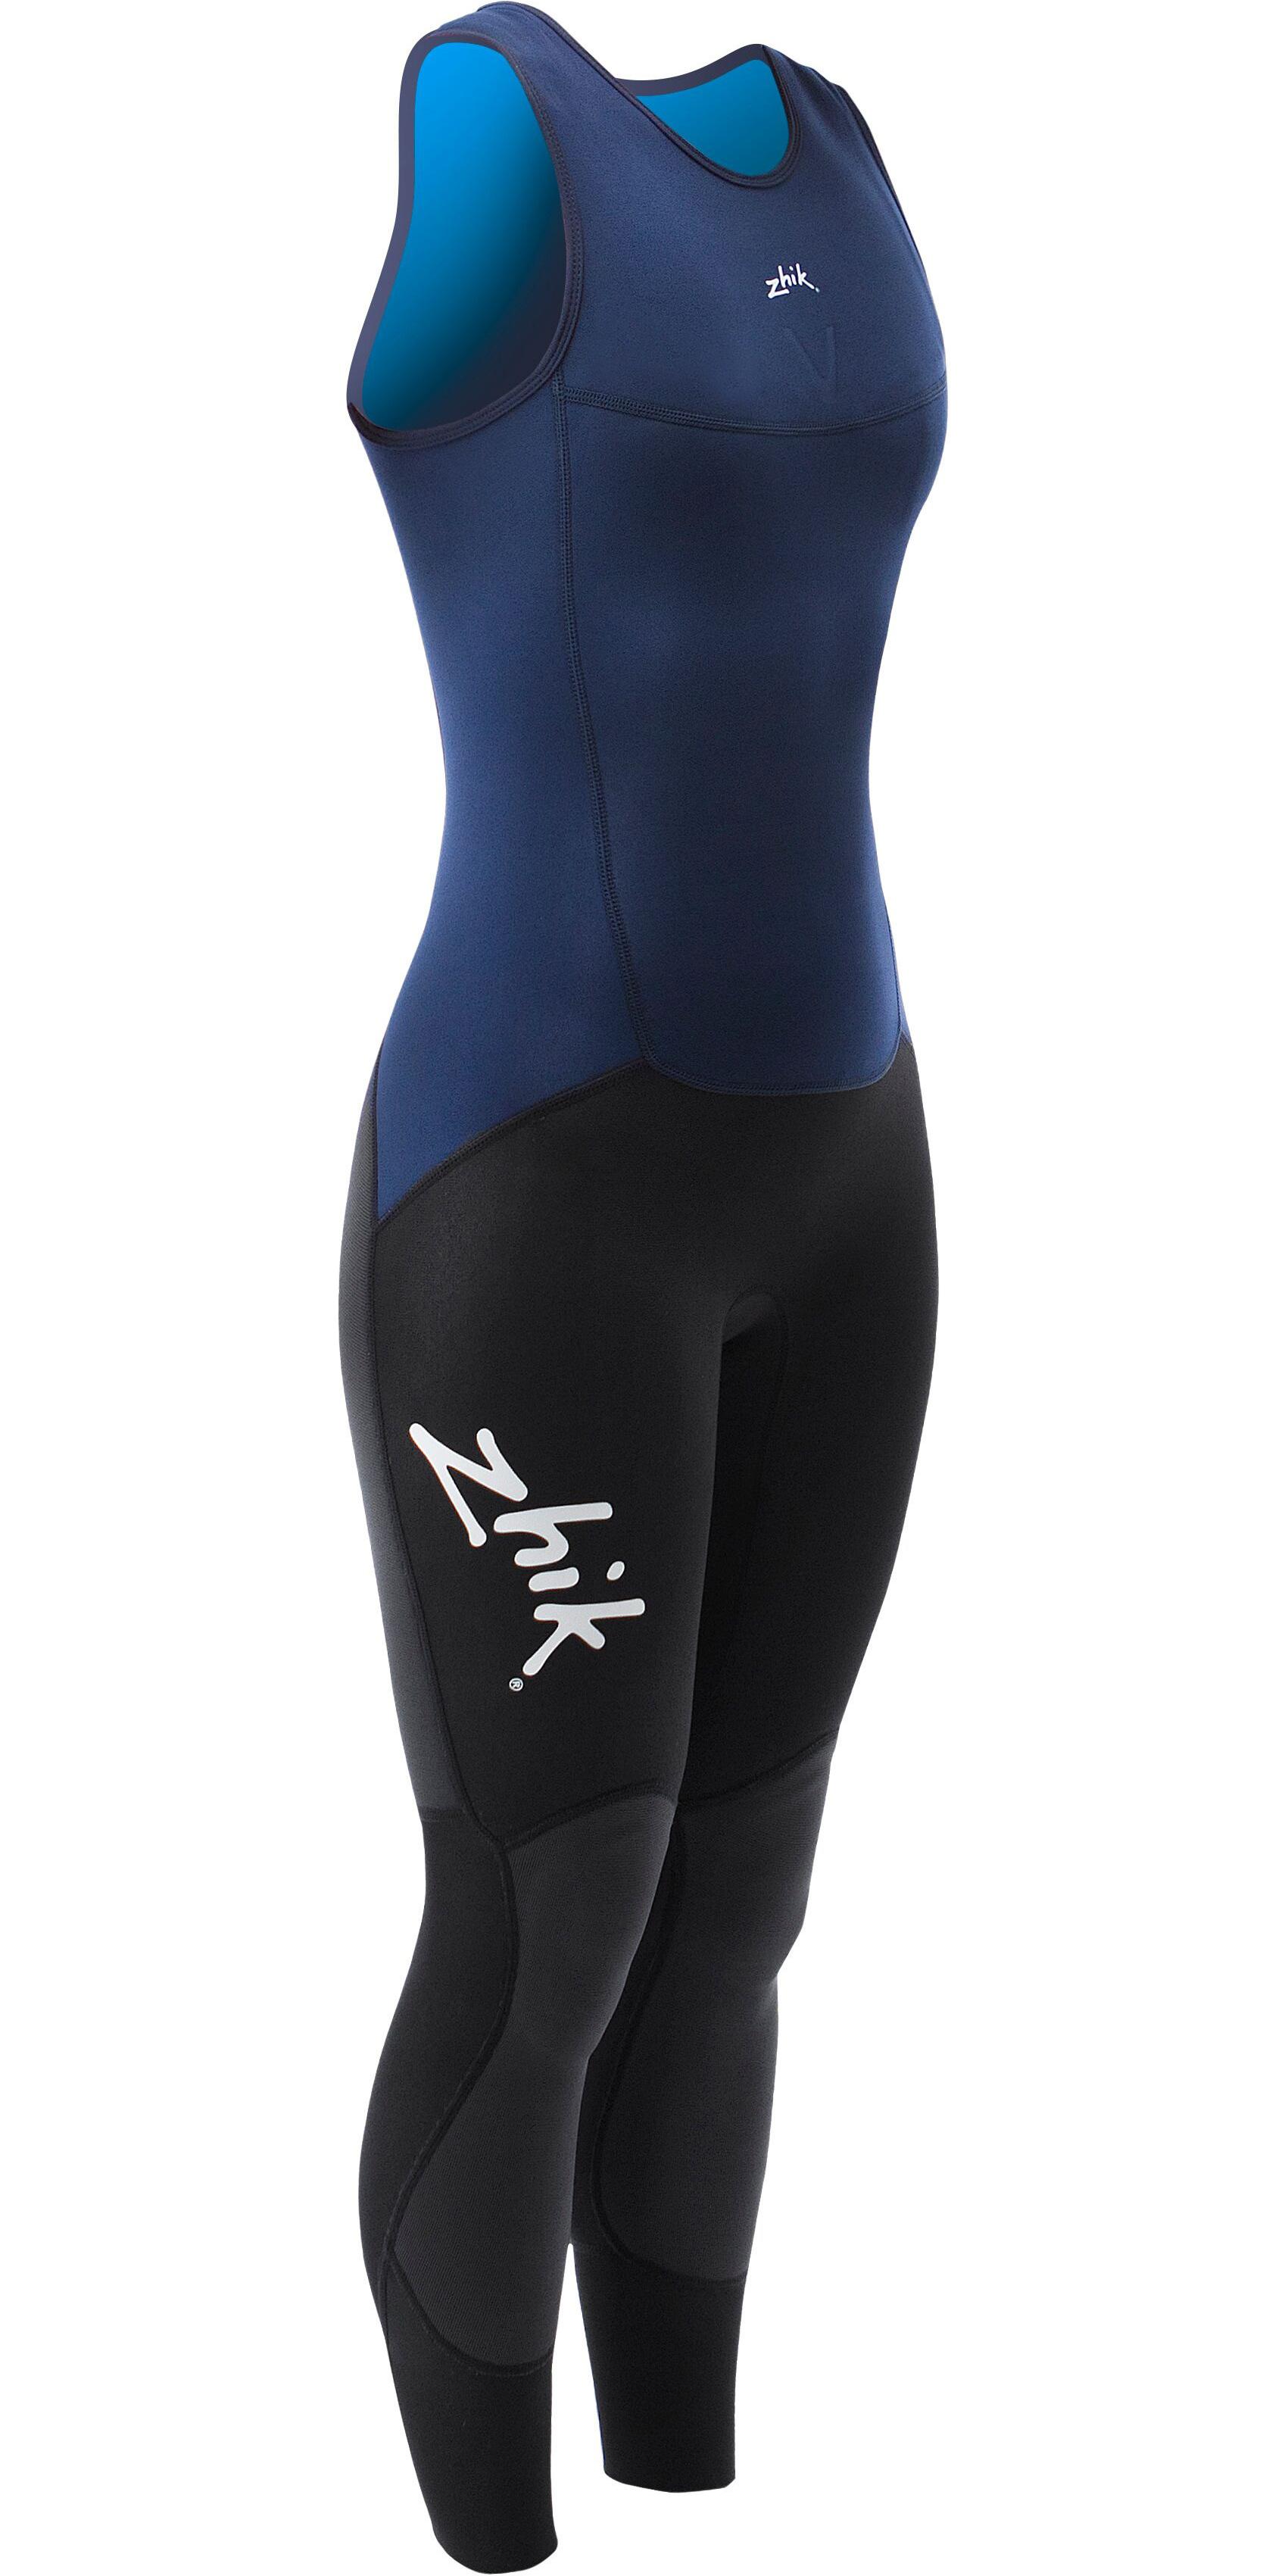 2020 Zhik Womens Microfleece V 1mm Neoprene Long Sleeve Top & Long John Combi Set